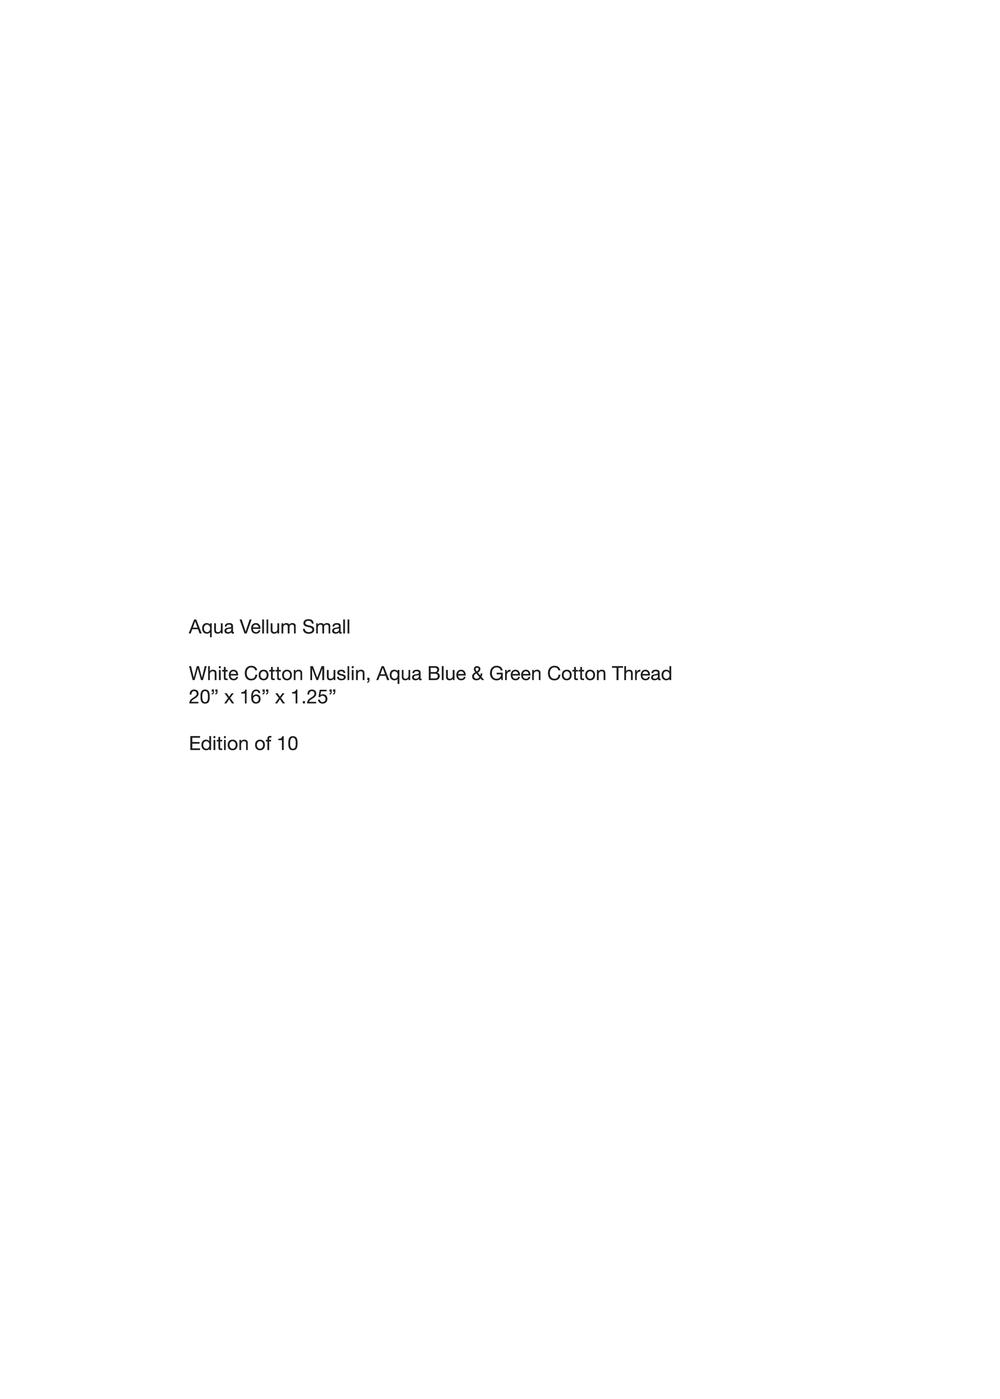 Nicole Patel Aqua Vellum Small Text-01.png